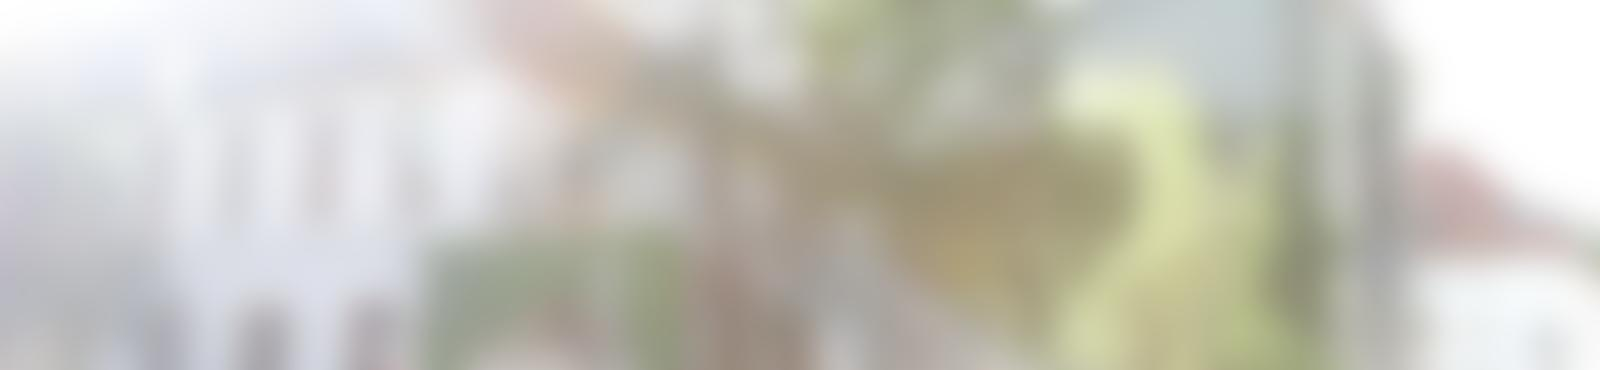 Blurred e8a015f1 c094 42ed b8d4 0ca2e4de5f4f